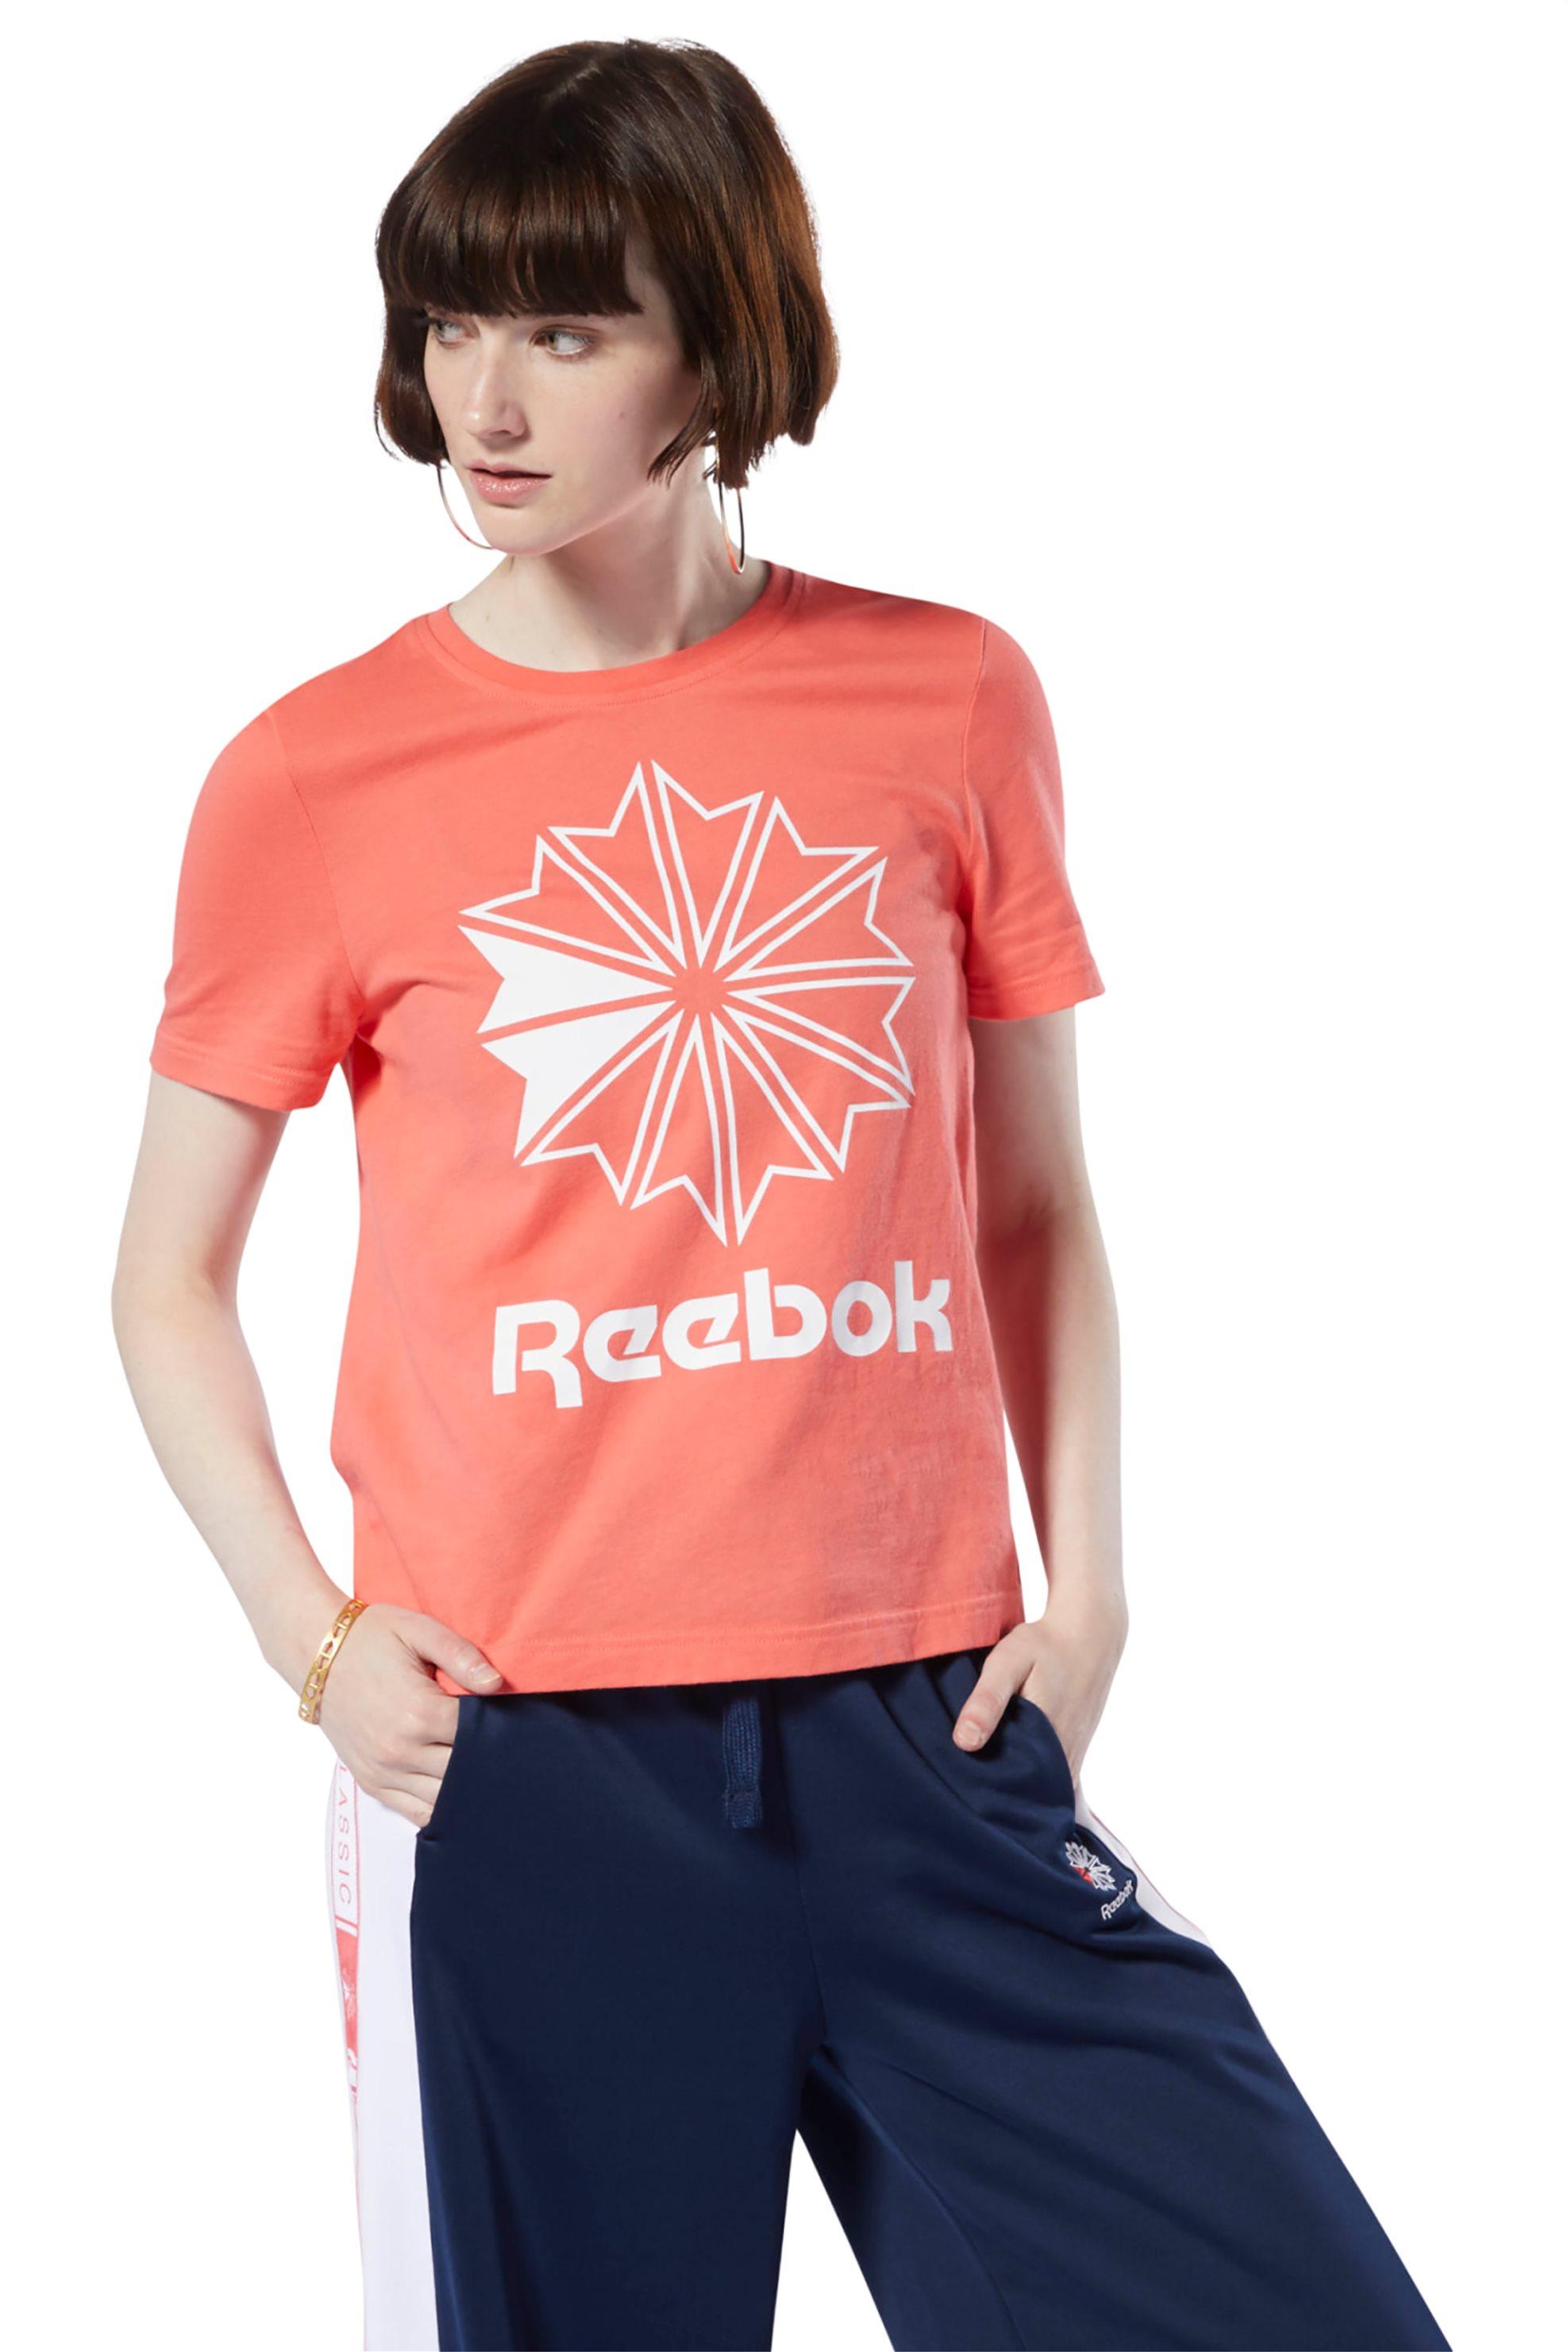 Reebok γυναικείο T-shirt με λογότυπο - DT7223 - Κοραλί γυναικα   αθλητικα   αθλητικά ρούχα   μπλούζες   t shirts